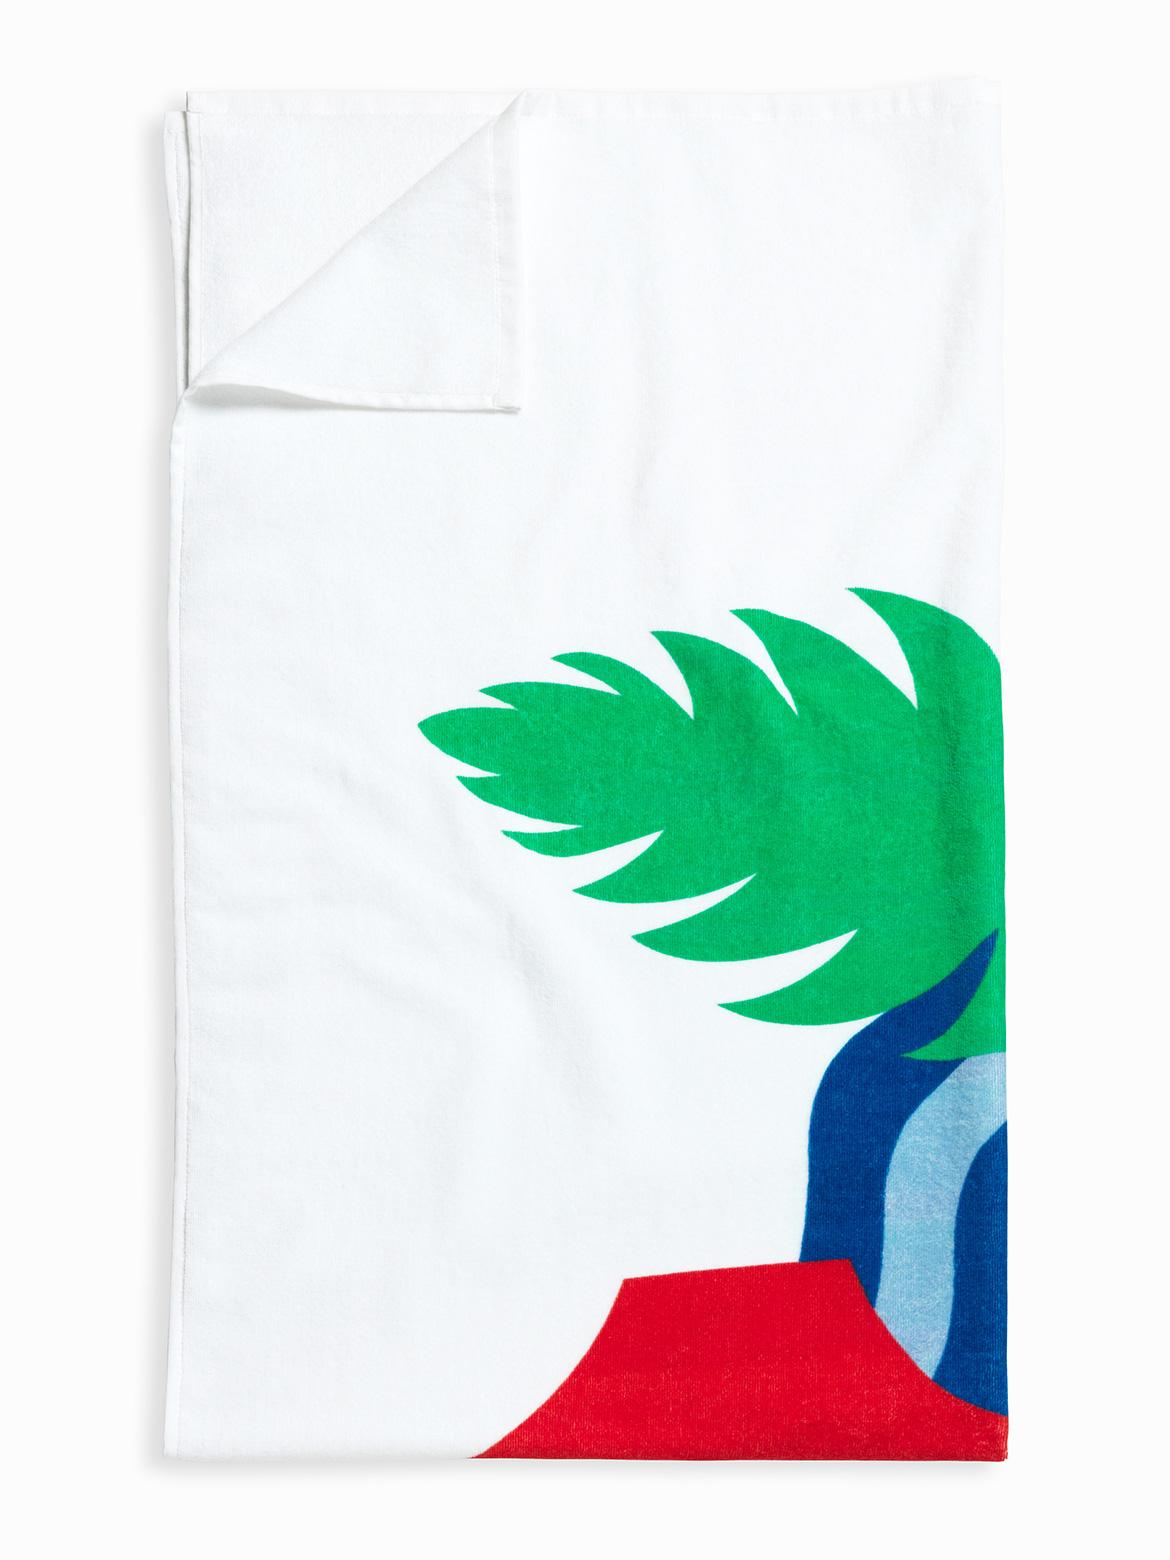 chadkouri-tanlinesbeachtowel-unisonhome-folded